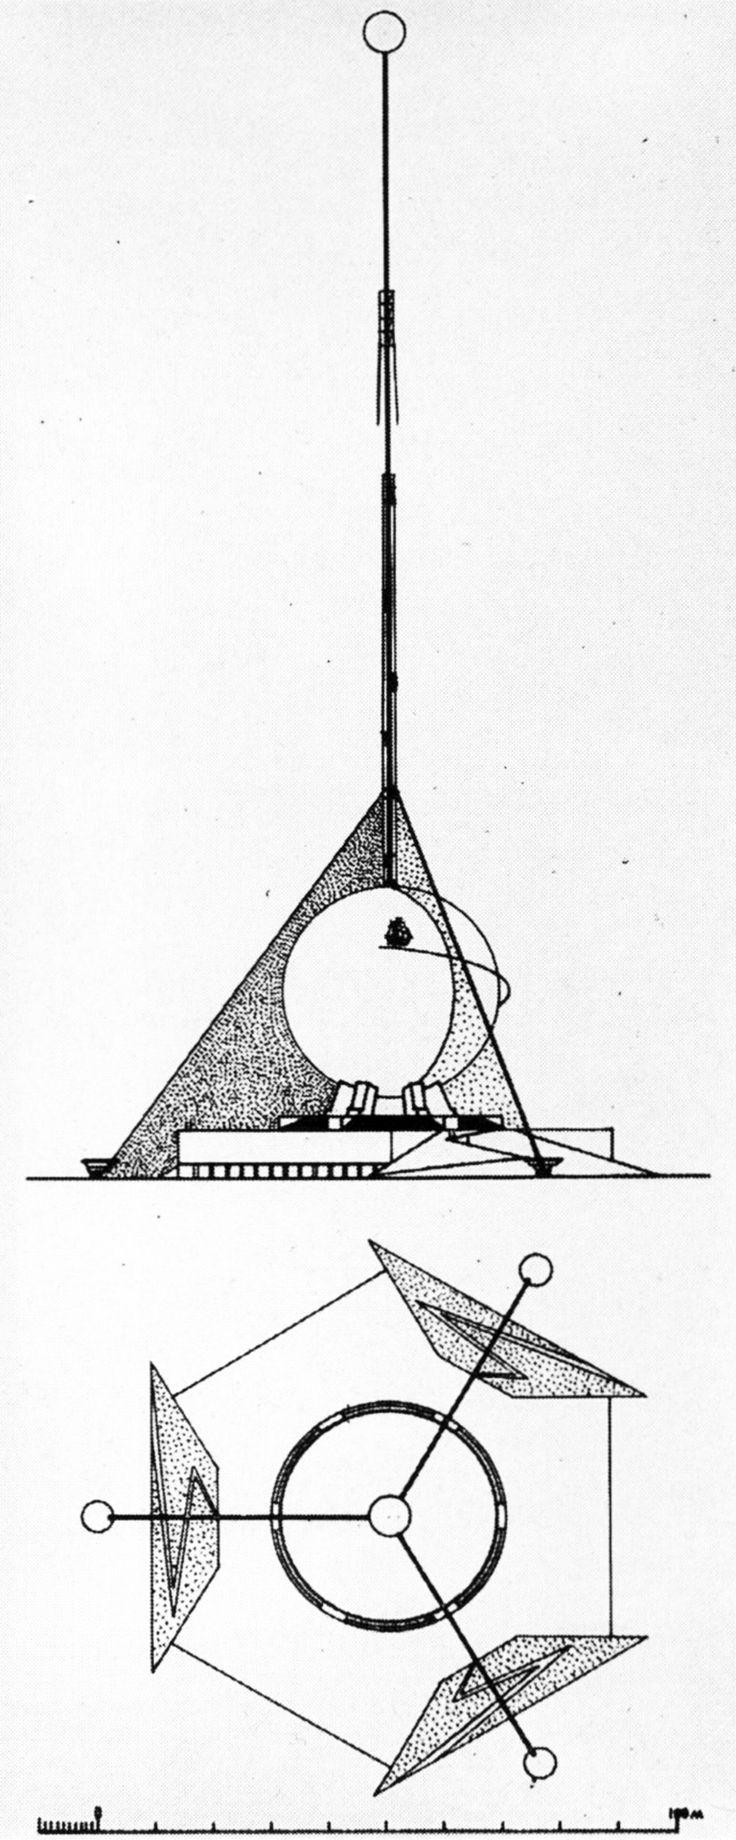 Krutikov, Varentsov, and Bunin, Competition Design for the Columbus Monument, Santo Domingo, Dominican Republic, 1929